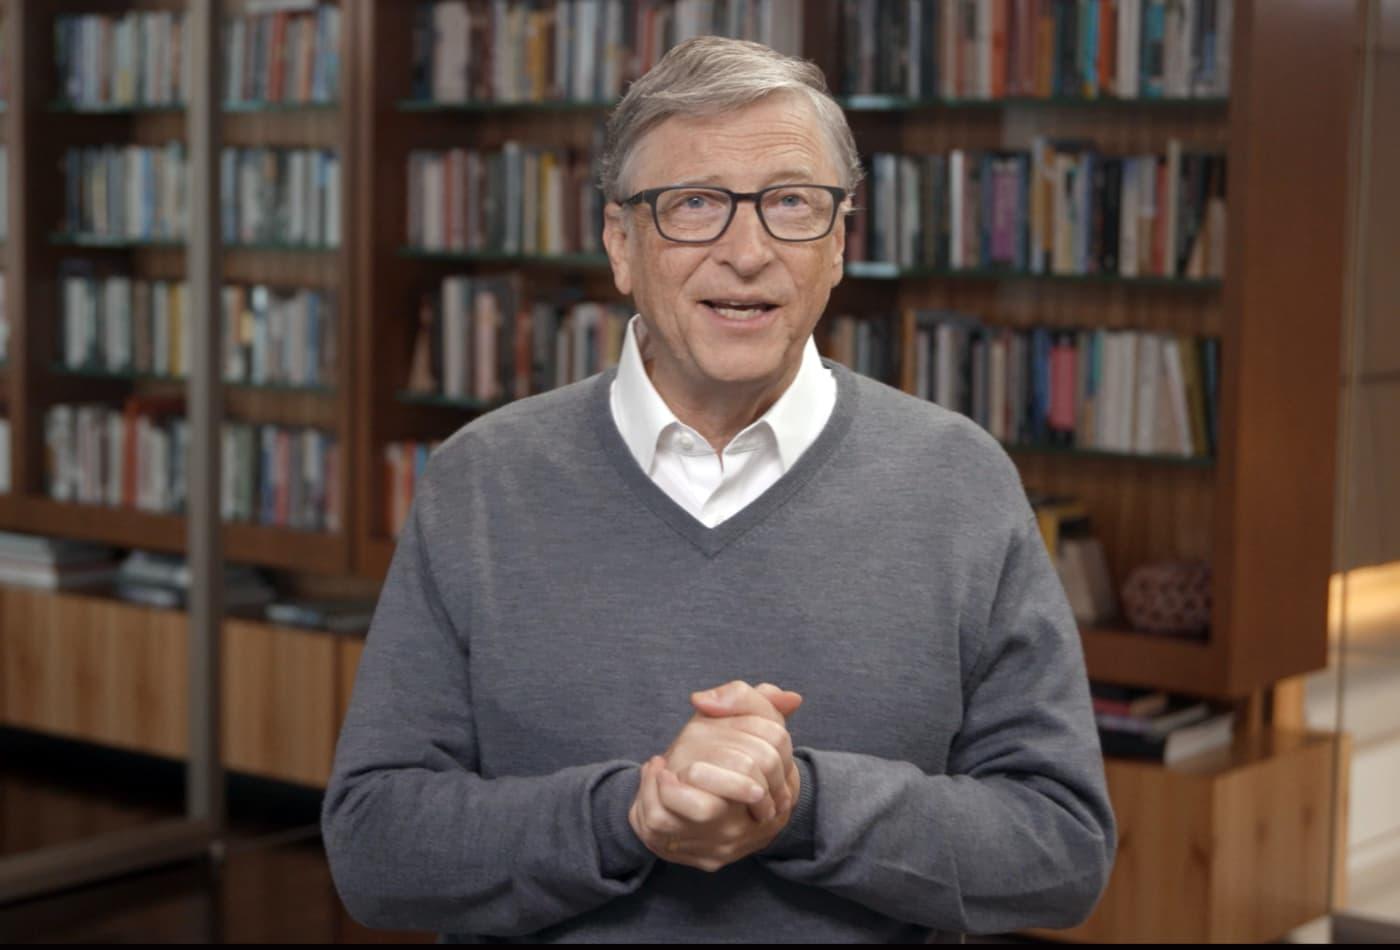 Bill Gates warns against coronavirus vaccine going to highest bidder — 'We'll have a deadlier pandemic'